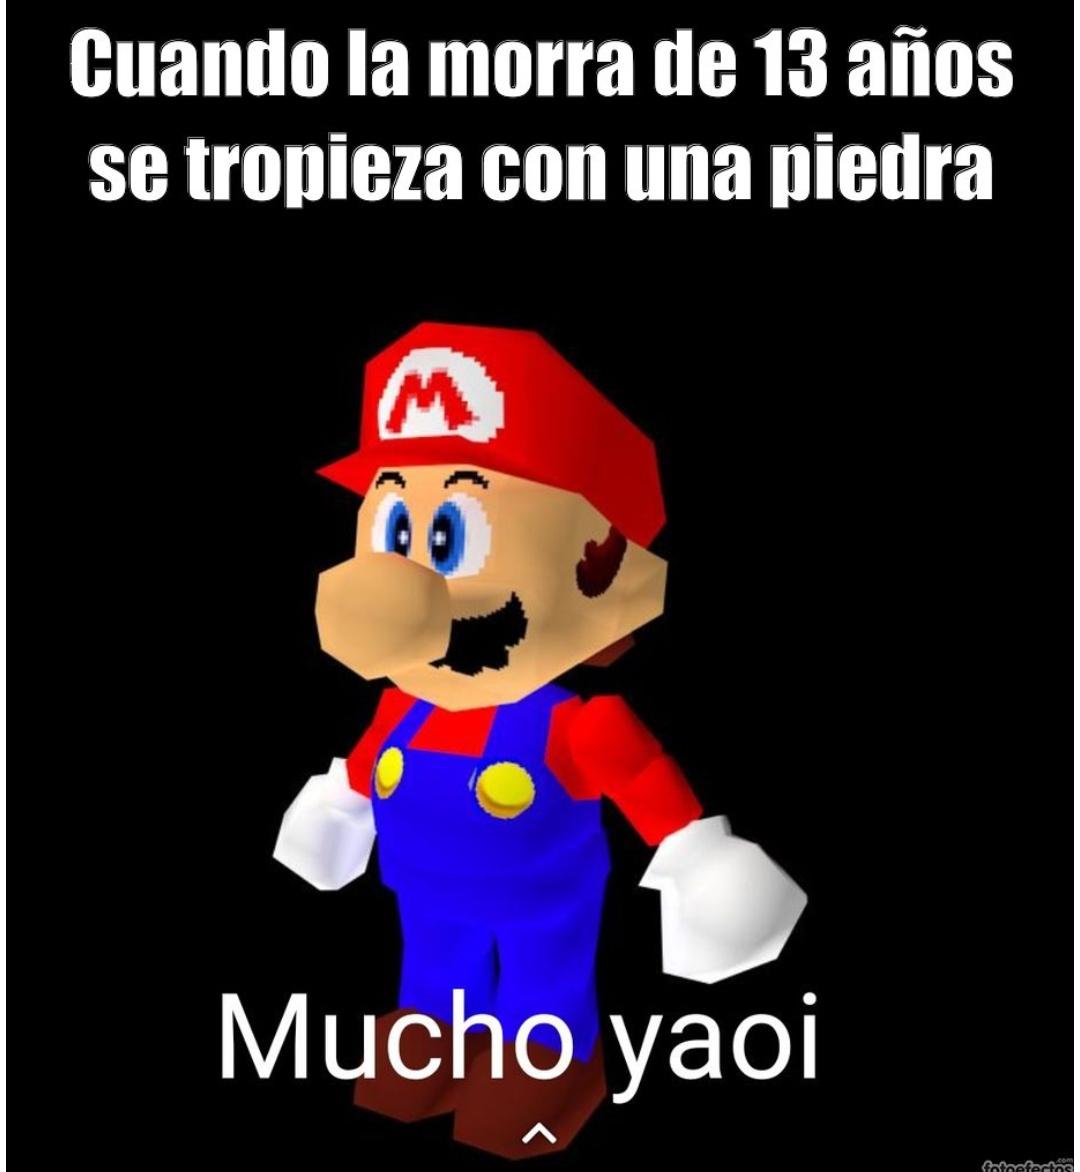 Mucho yaoi - meme